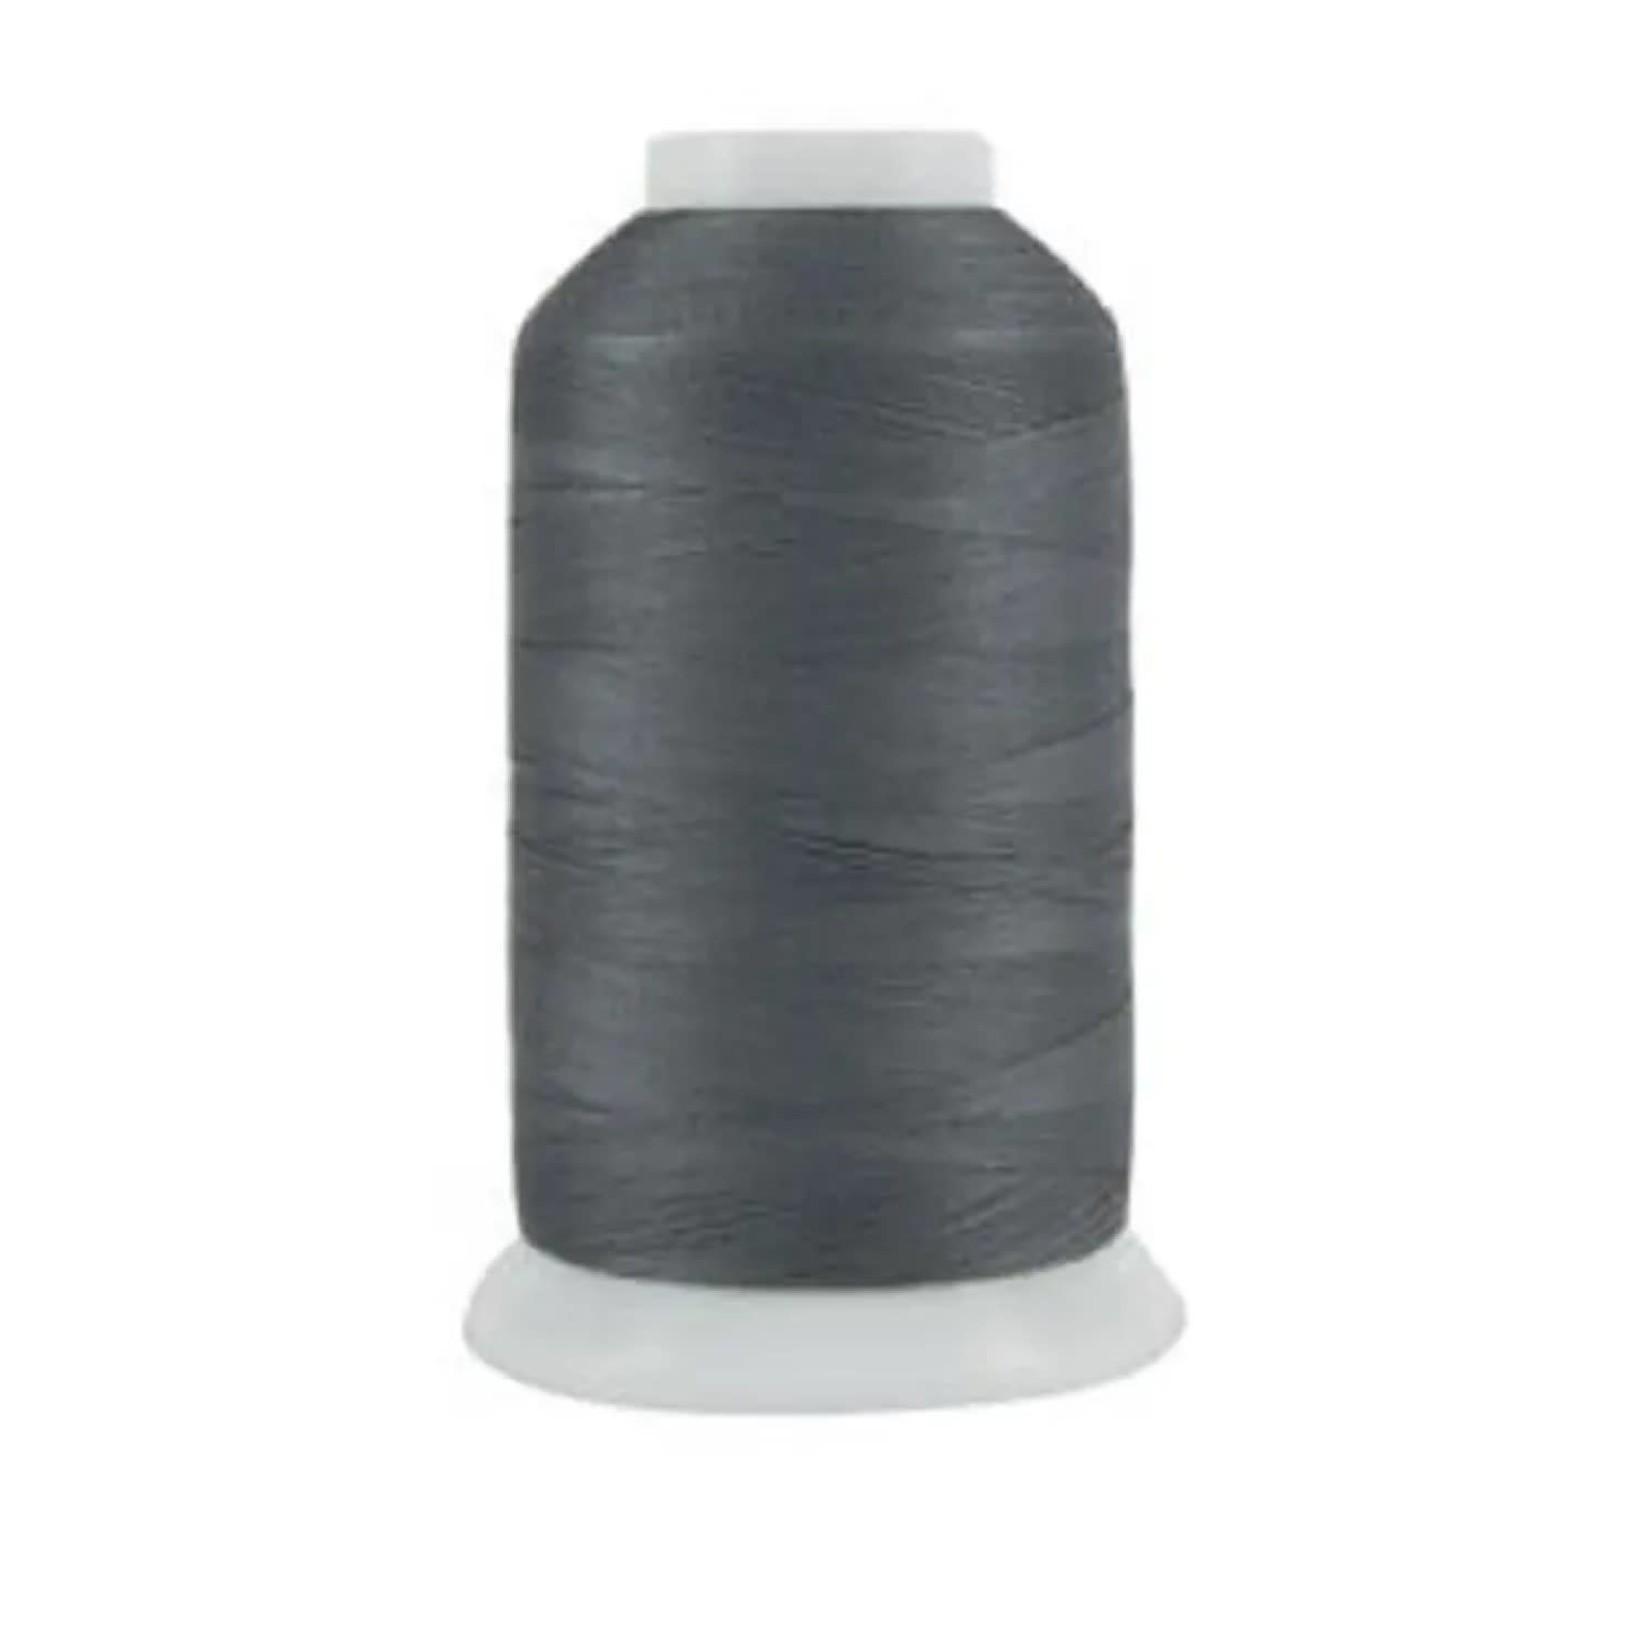 Superior Threads King Tut - #40 - 1828 m - 1028 Silver Bullet